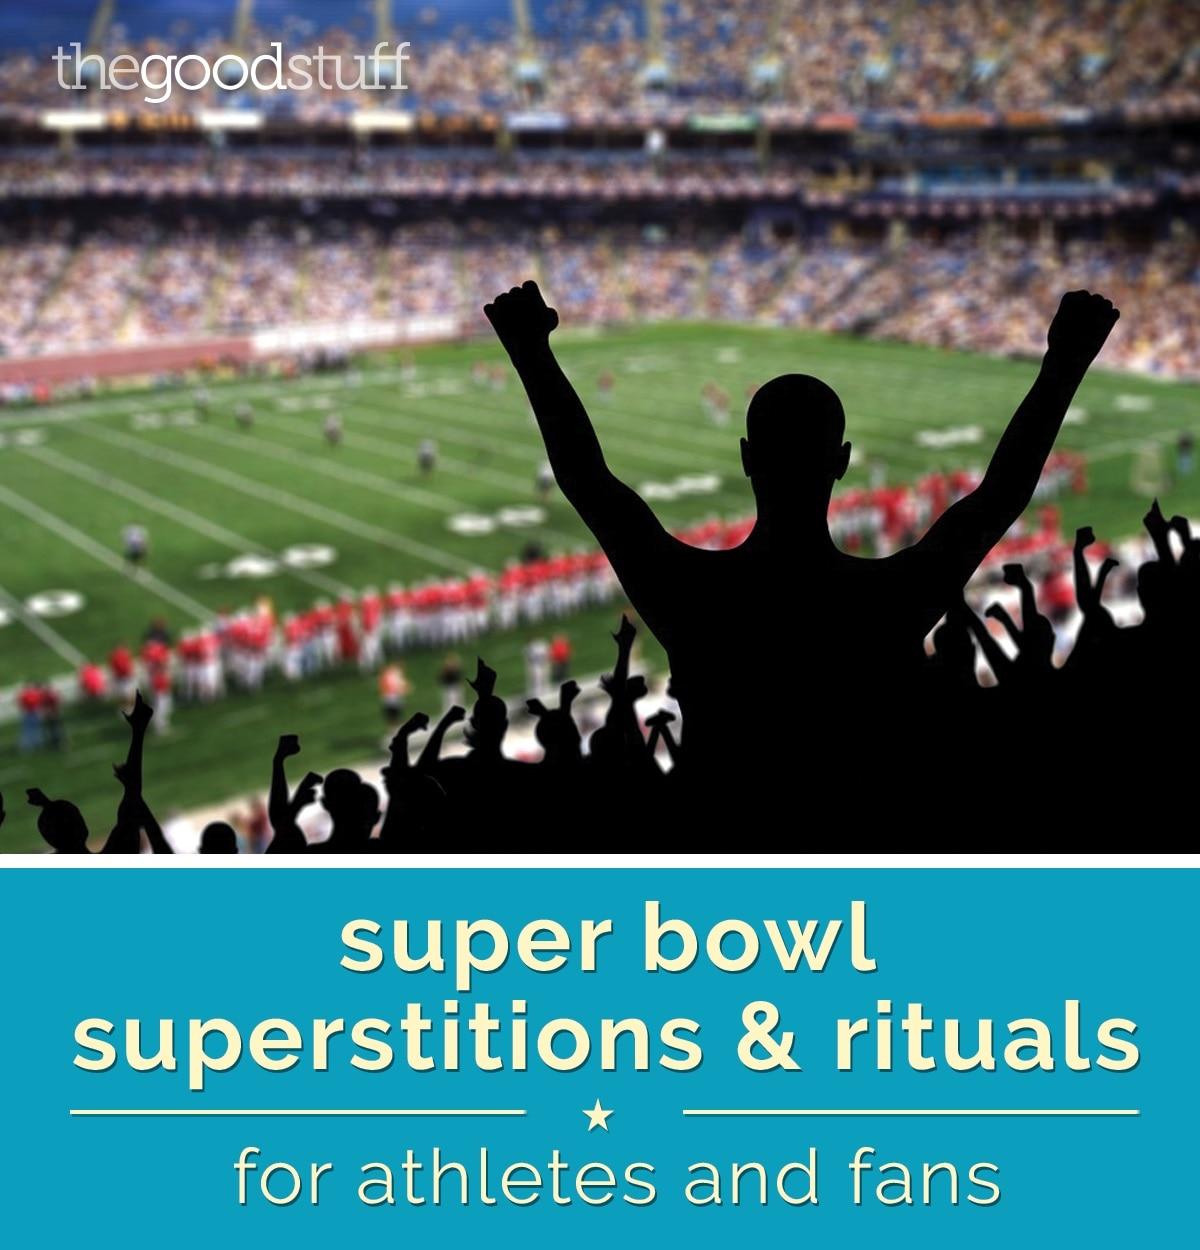 life-superbowl-superstitions